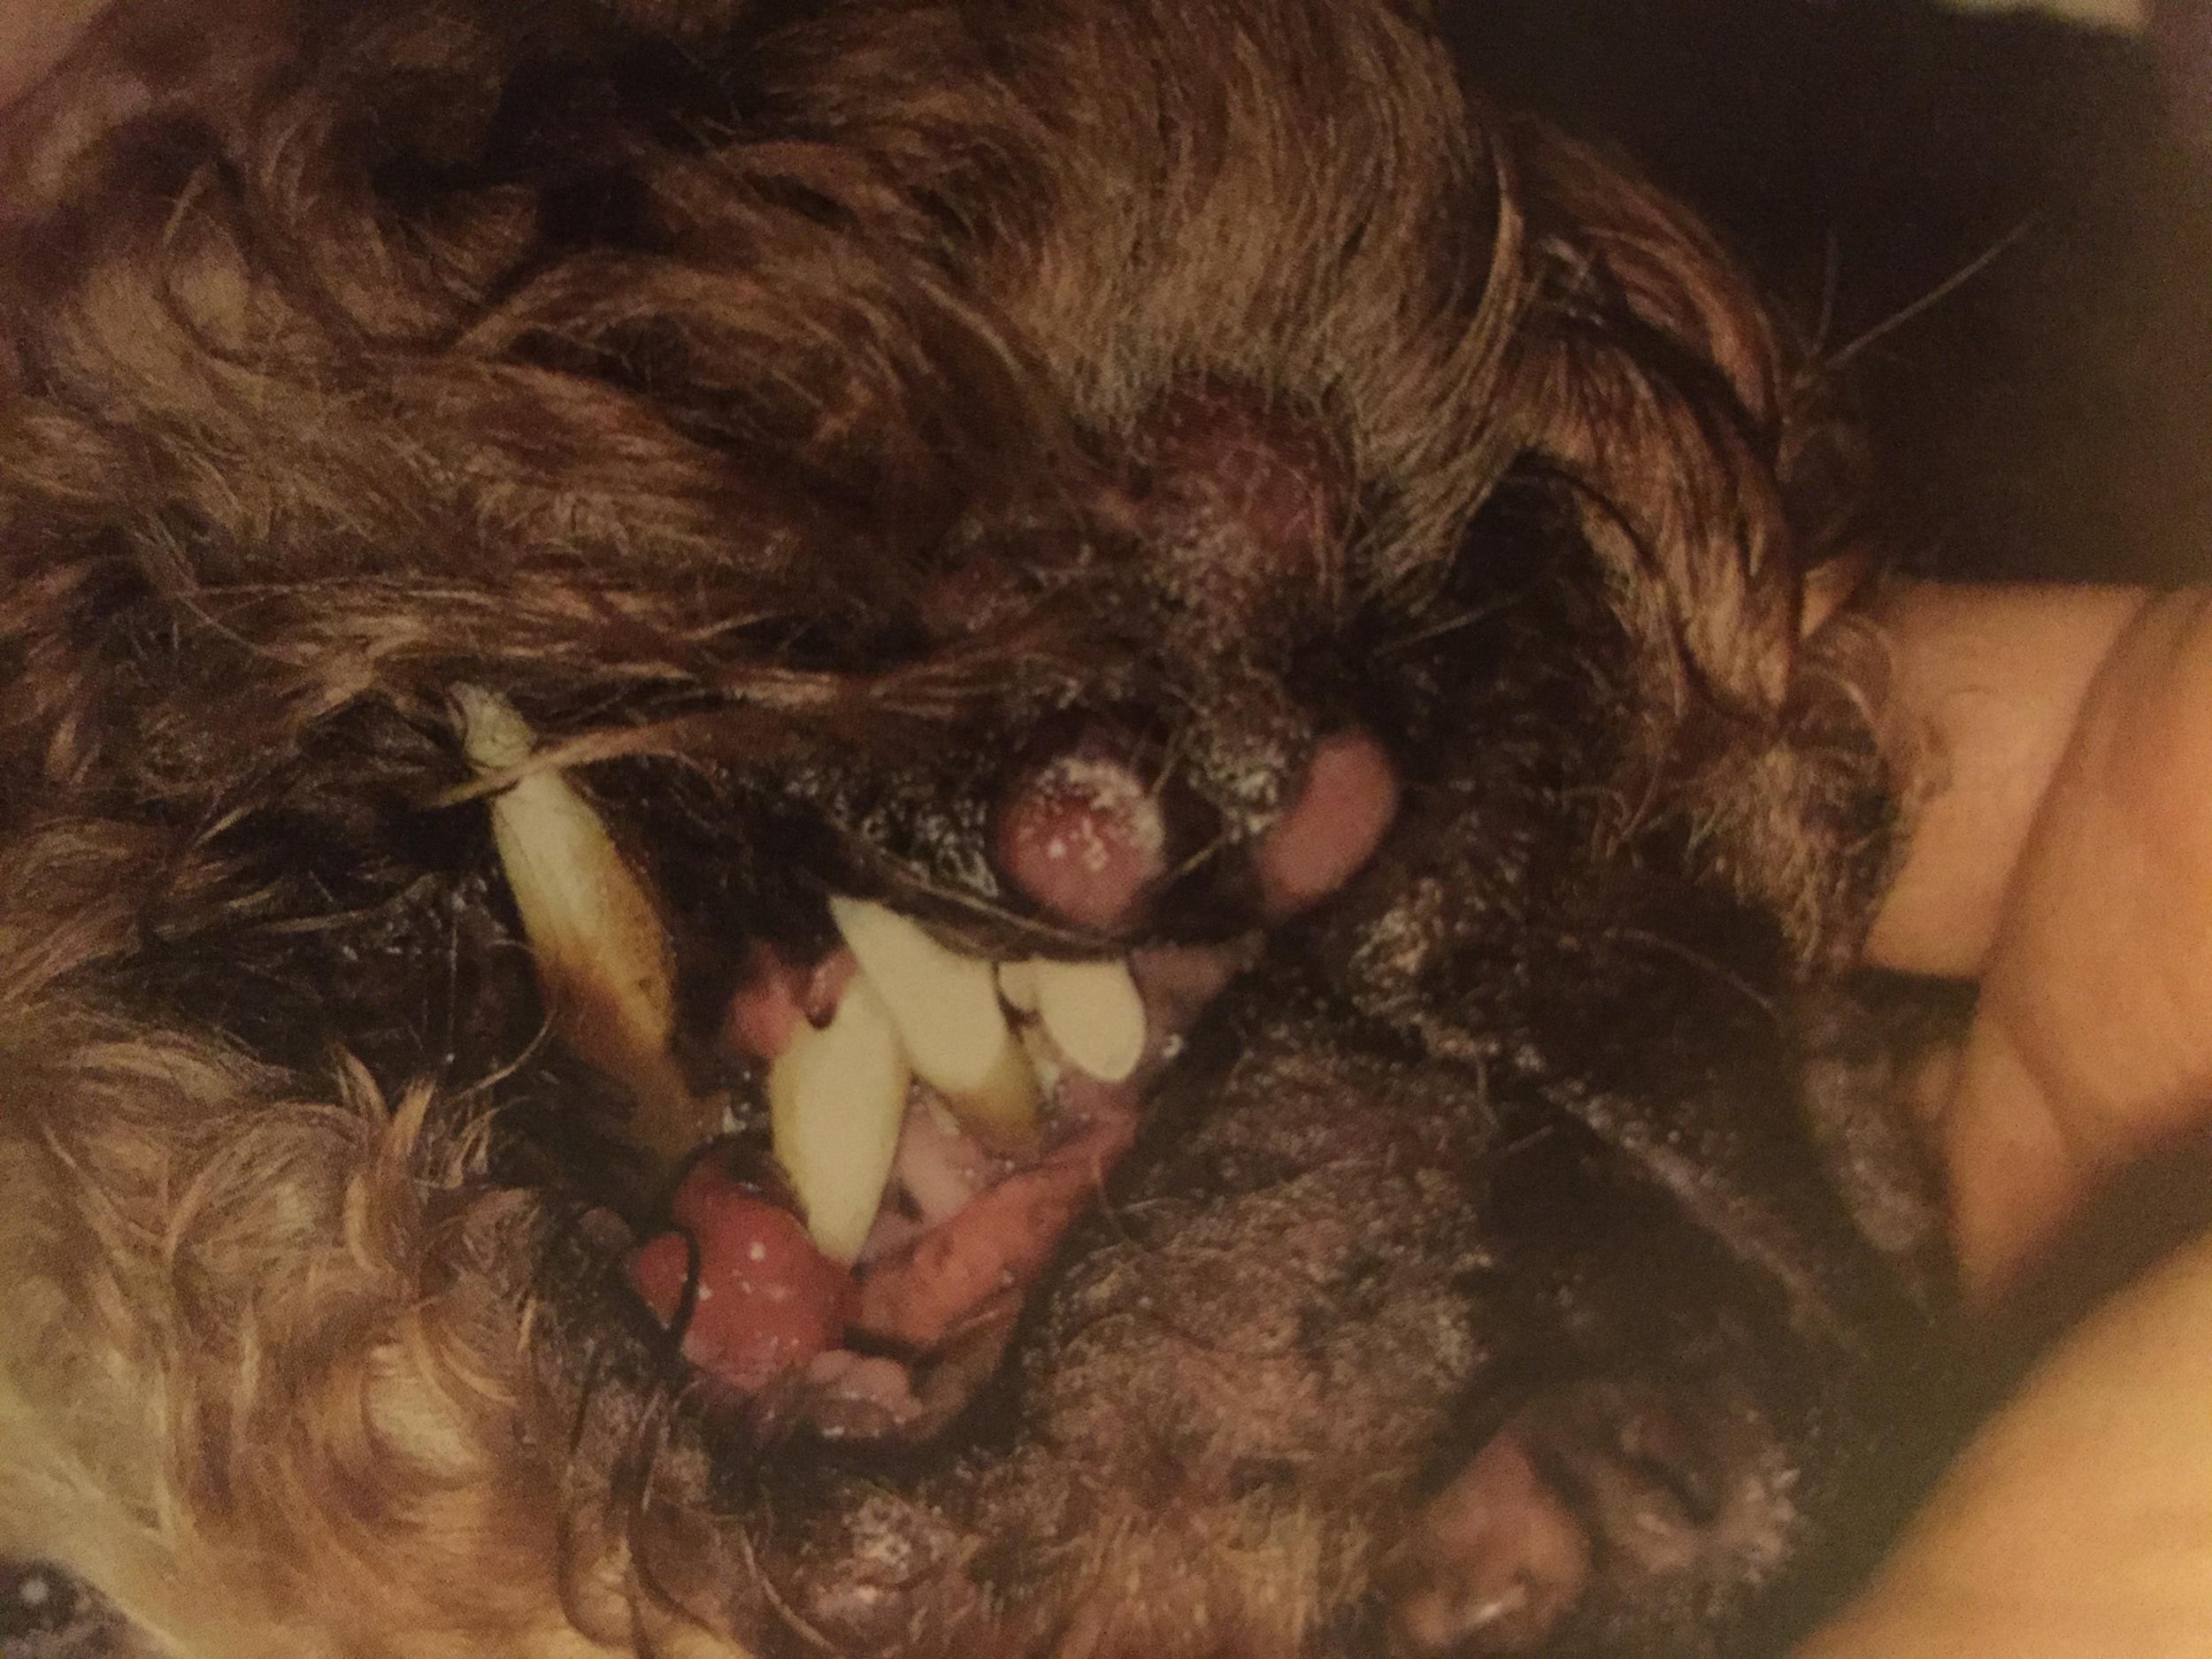 multiple lymphoma nodules around the muzzle